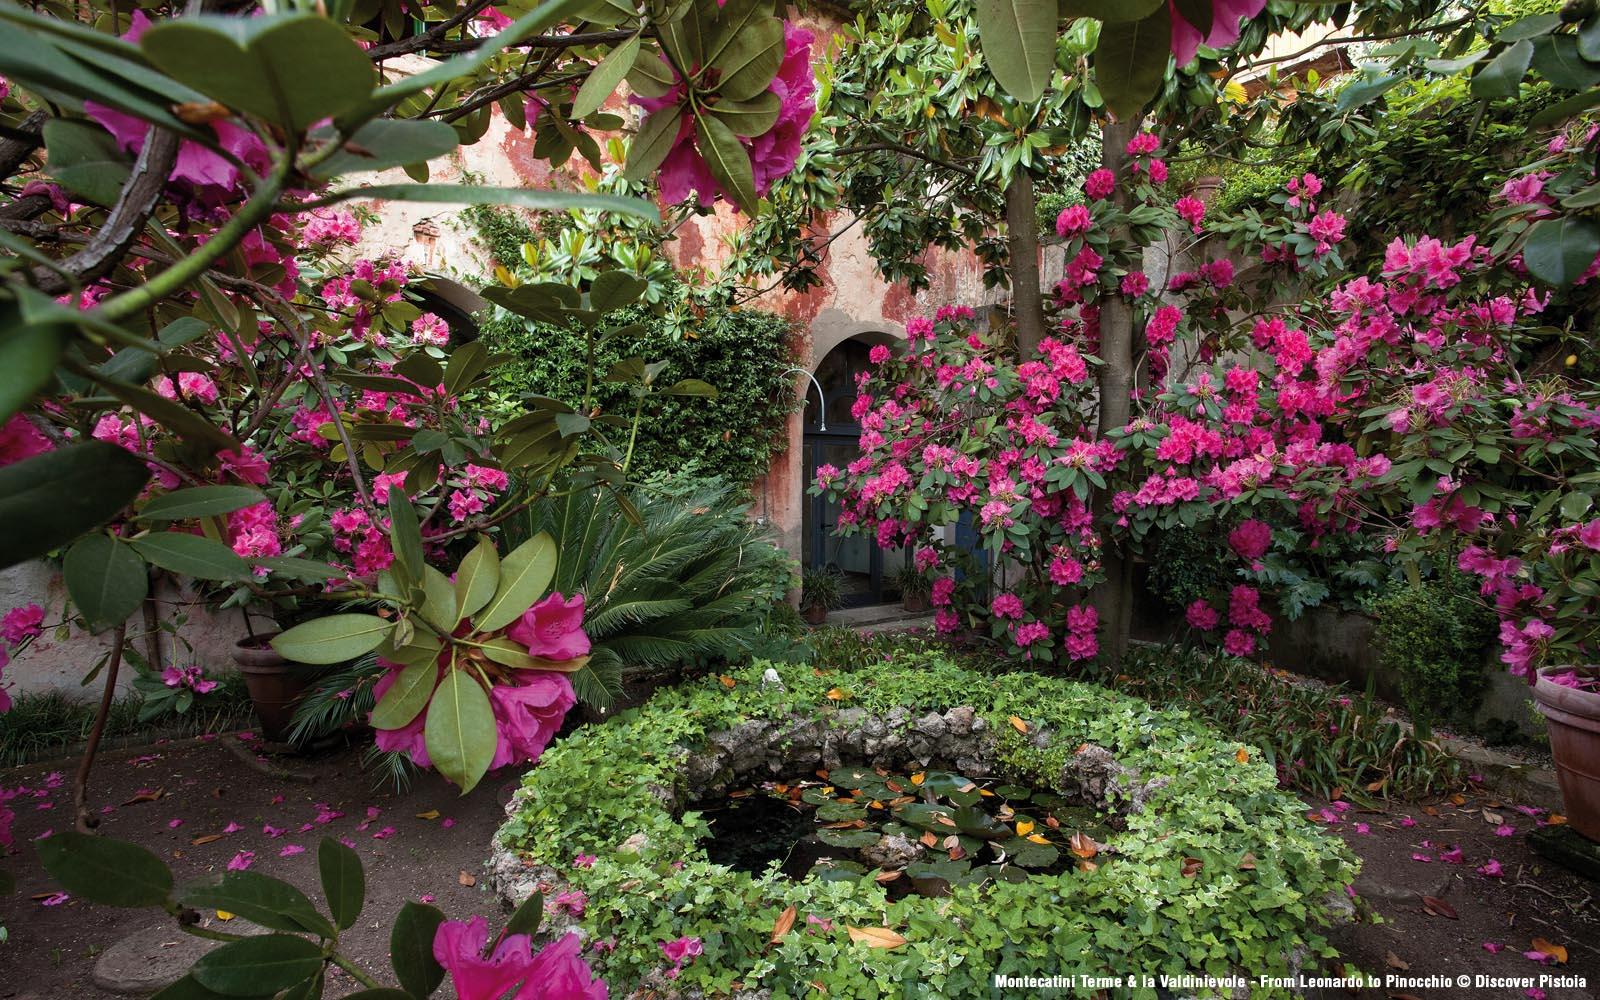 Buggiano buggiano between secret gardens and heritage for Garden giardini